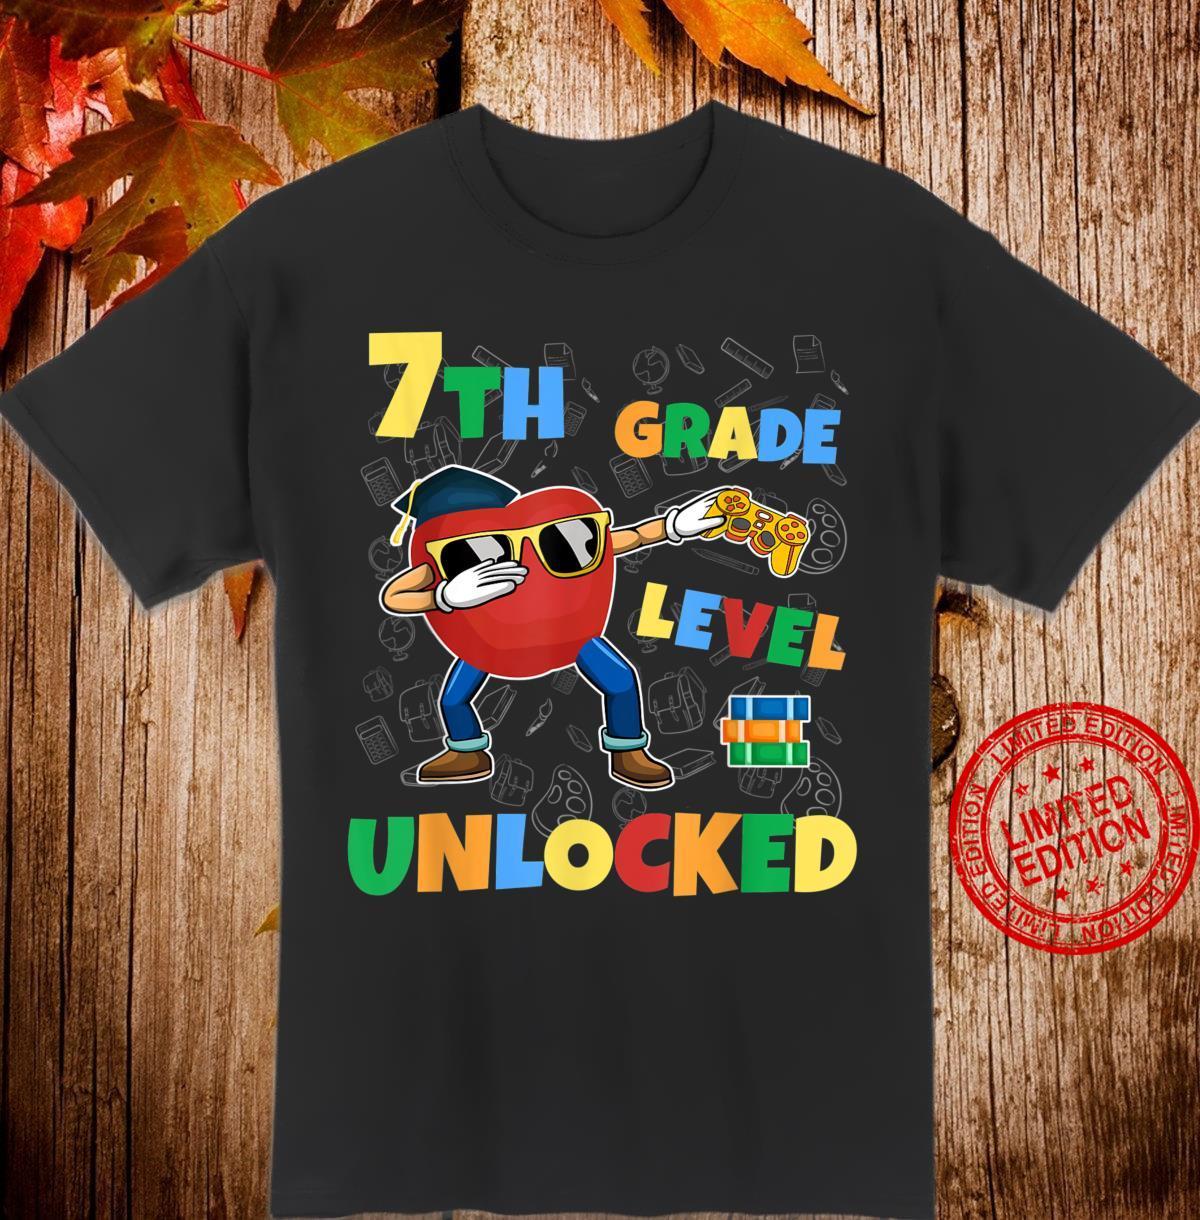 7th Grade Level Unlocked Dabbing Gamer First Day School Shirt